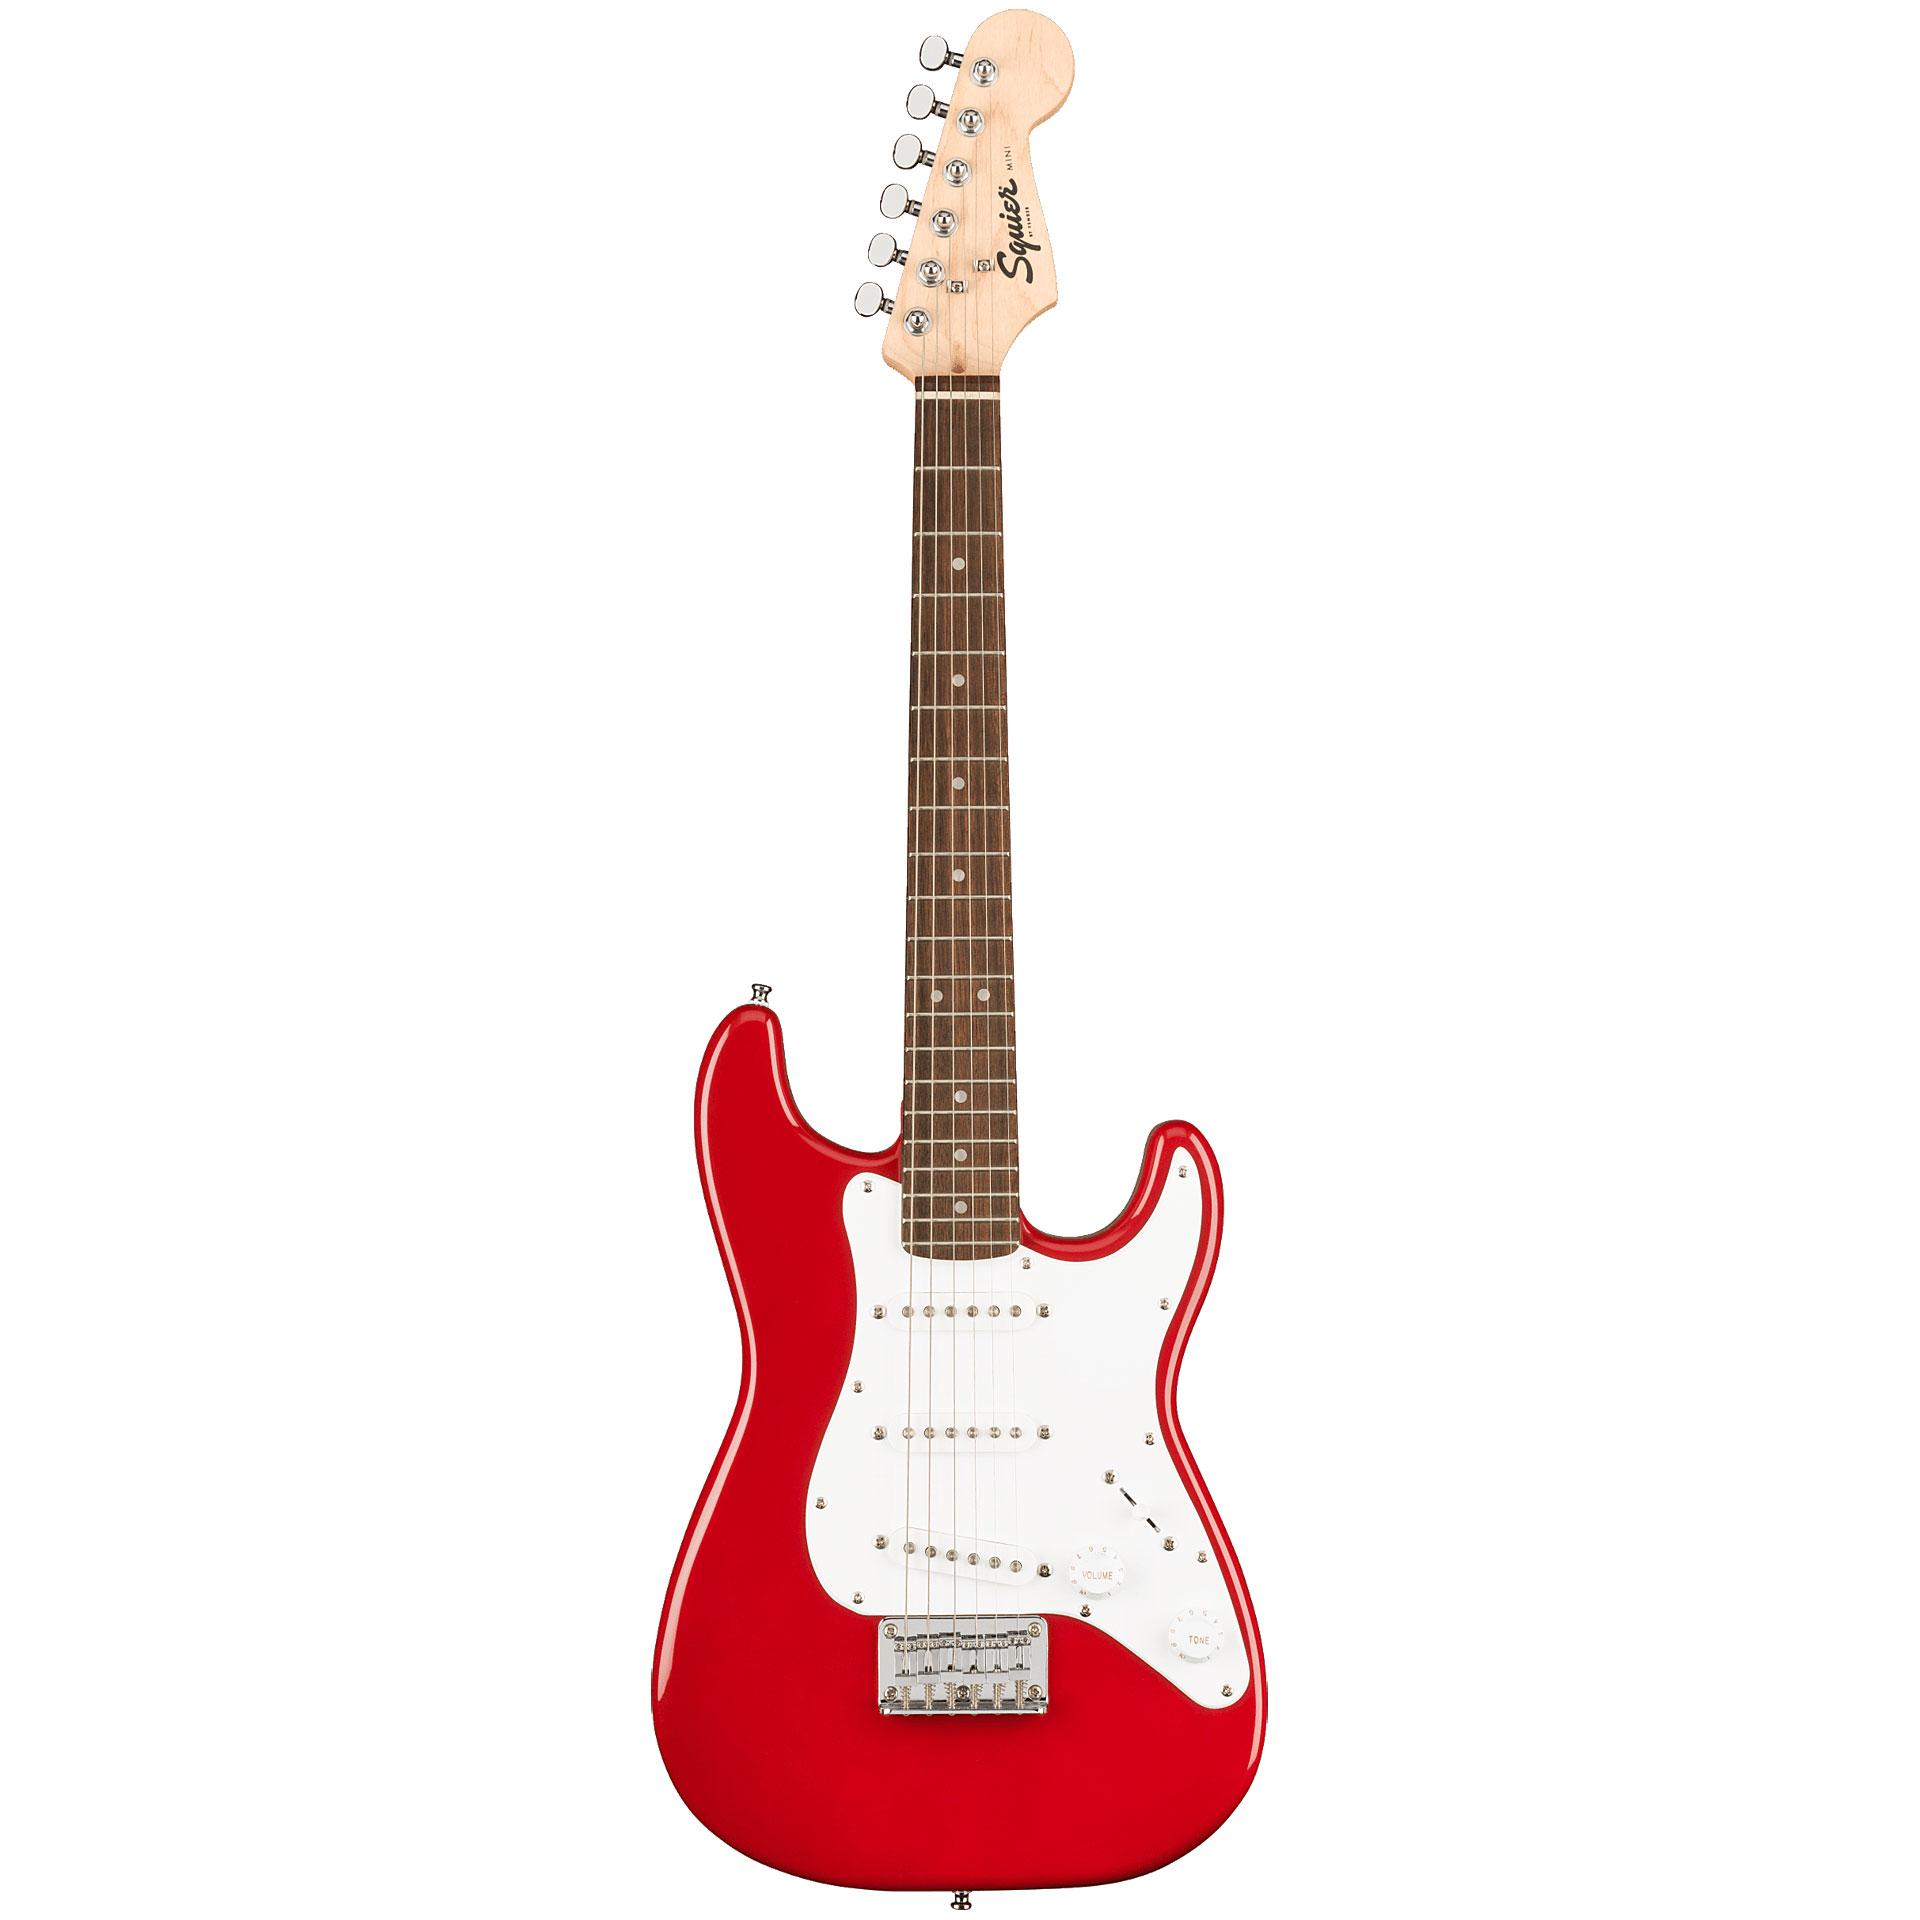 squier mini strat trd v2 guitare lectrique. Black Bedroom Furniture Sets. Home Design Ideas